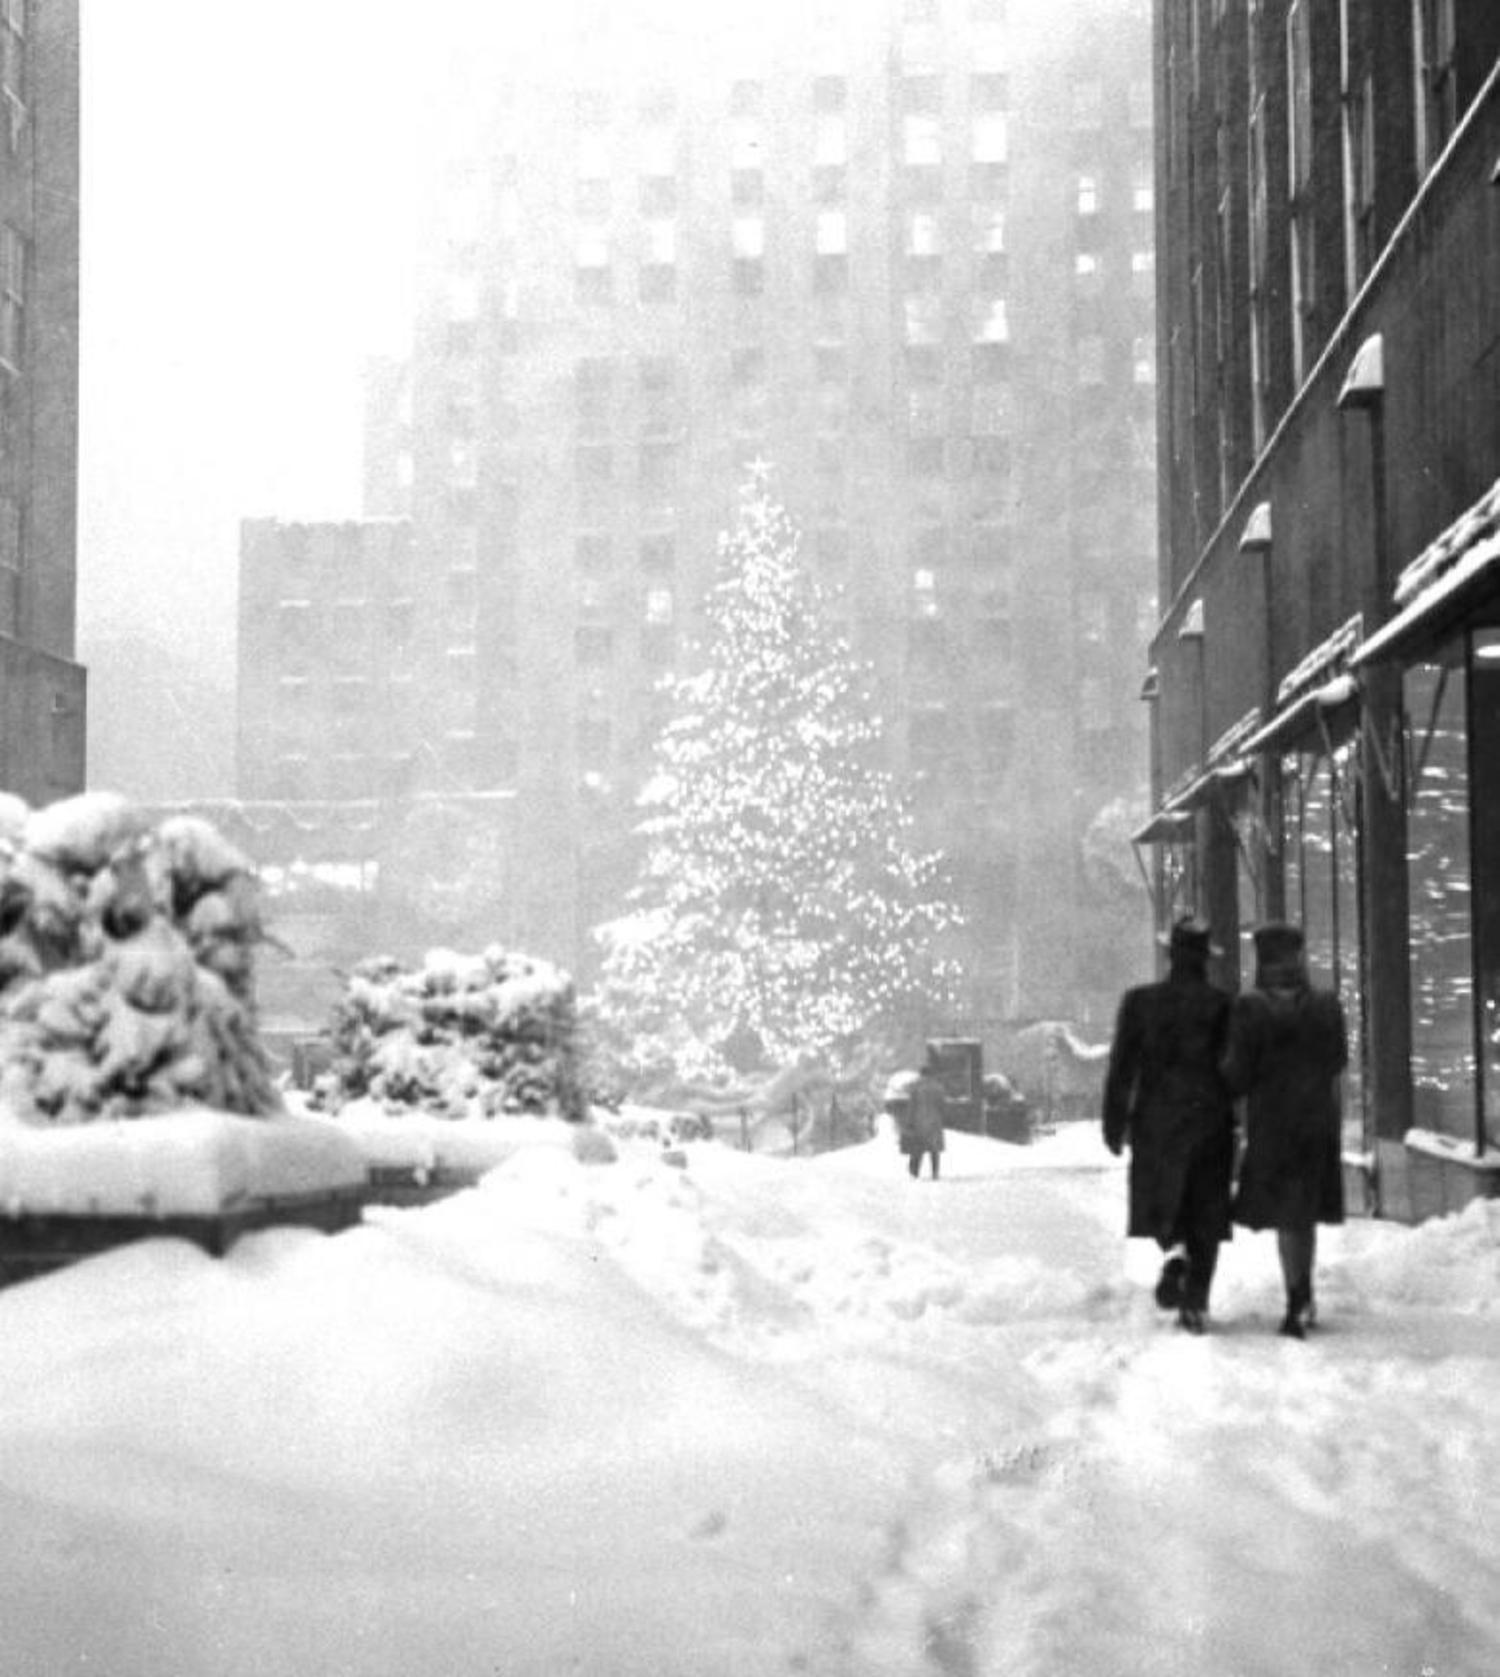 rockefeller center christmas tree 1947 - Nyc Christmas Shows